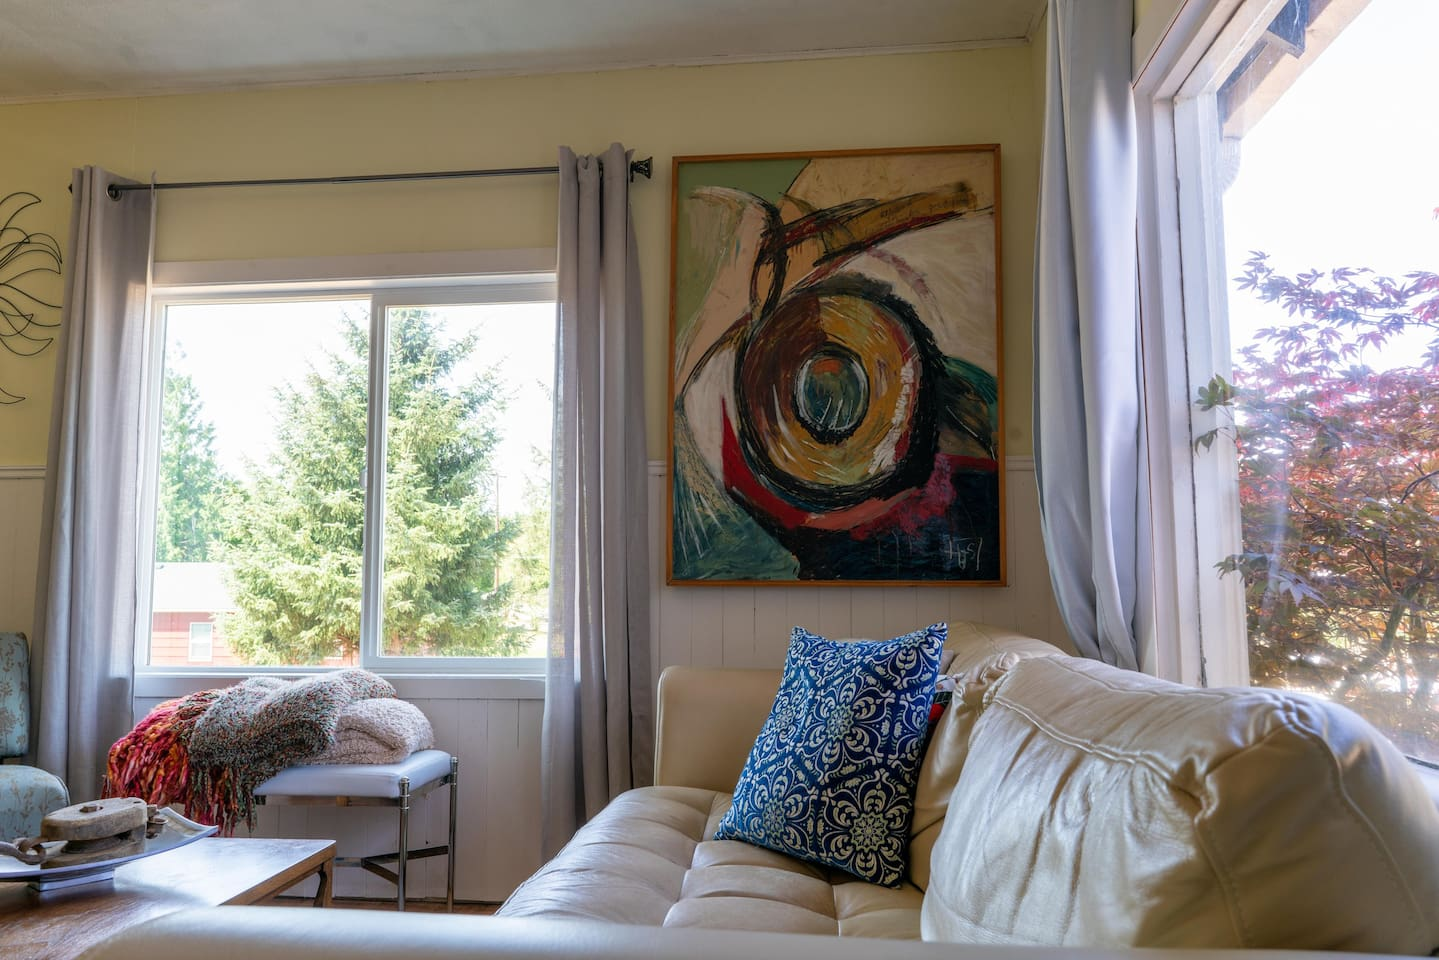 Cozy artsy home with huge sun windows